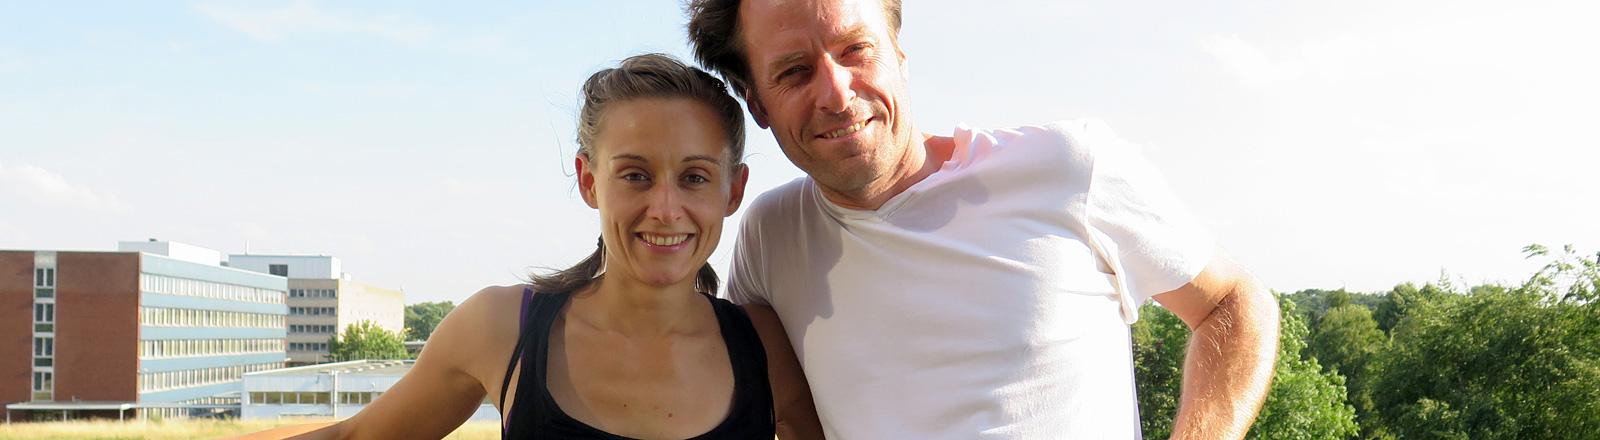 Olga und Gregor Witt